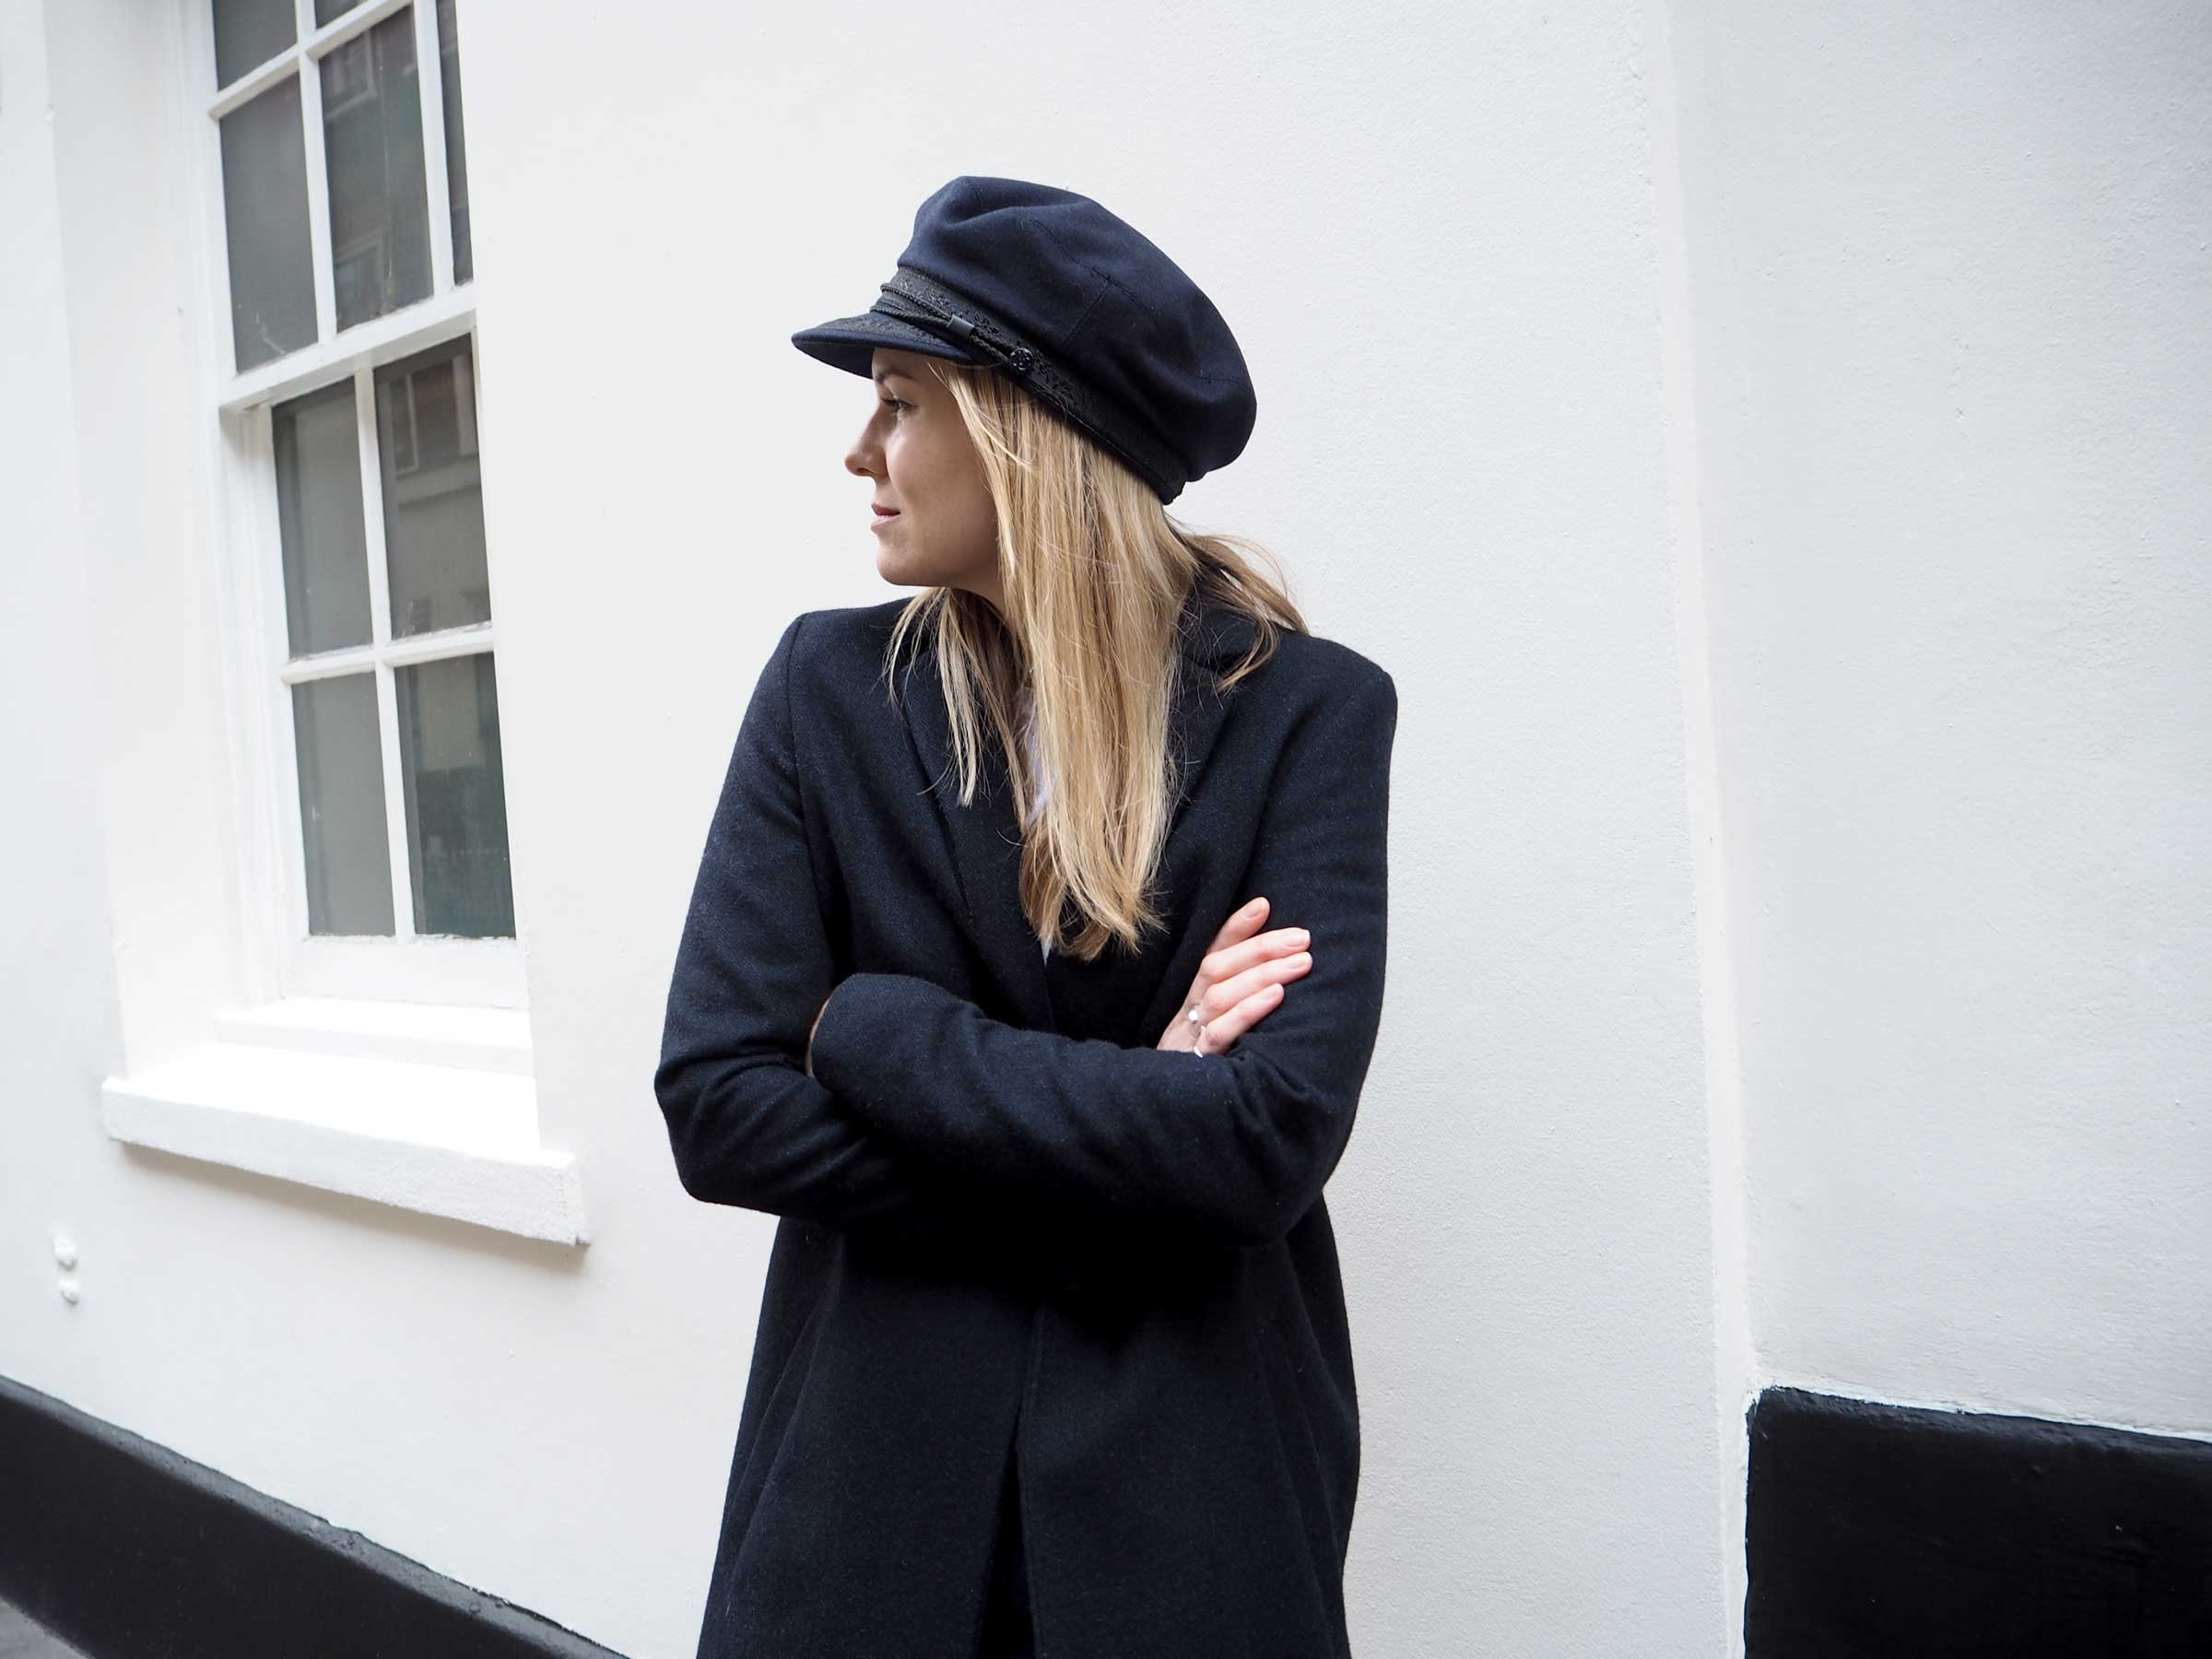 Style&Minimalism | It's Personal | Wearing Samsøe Coat, Isabel Marant Étoile Jeans, Jimmy Choo Rebel Bag, Saint James Mariners Cap